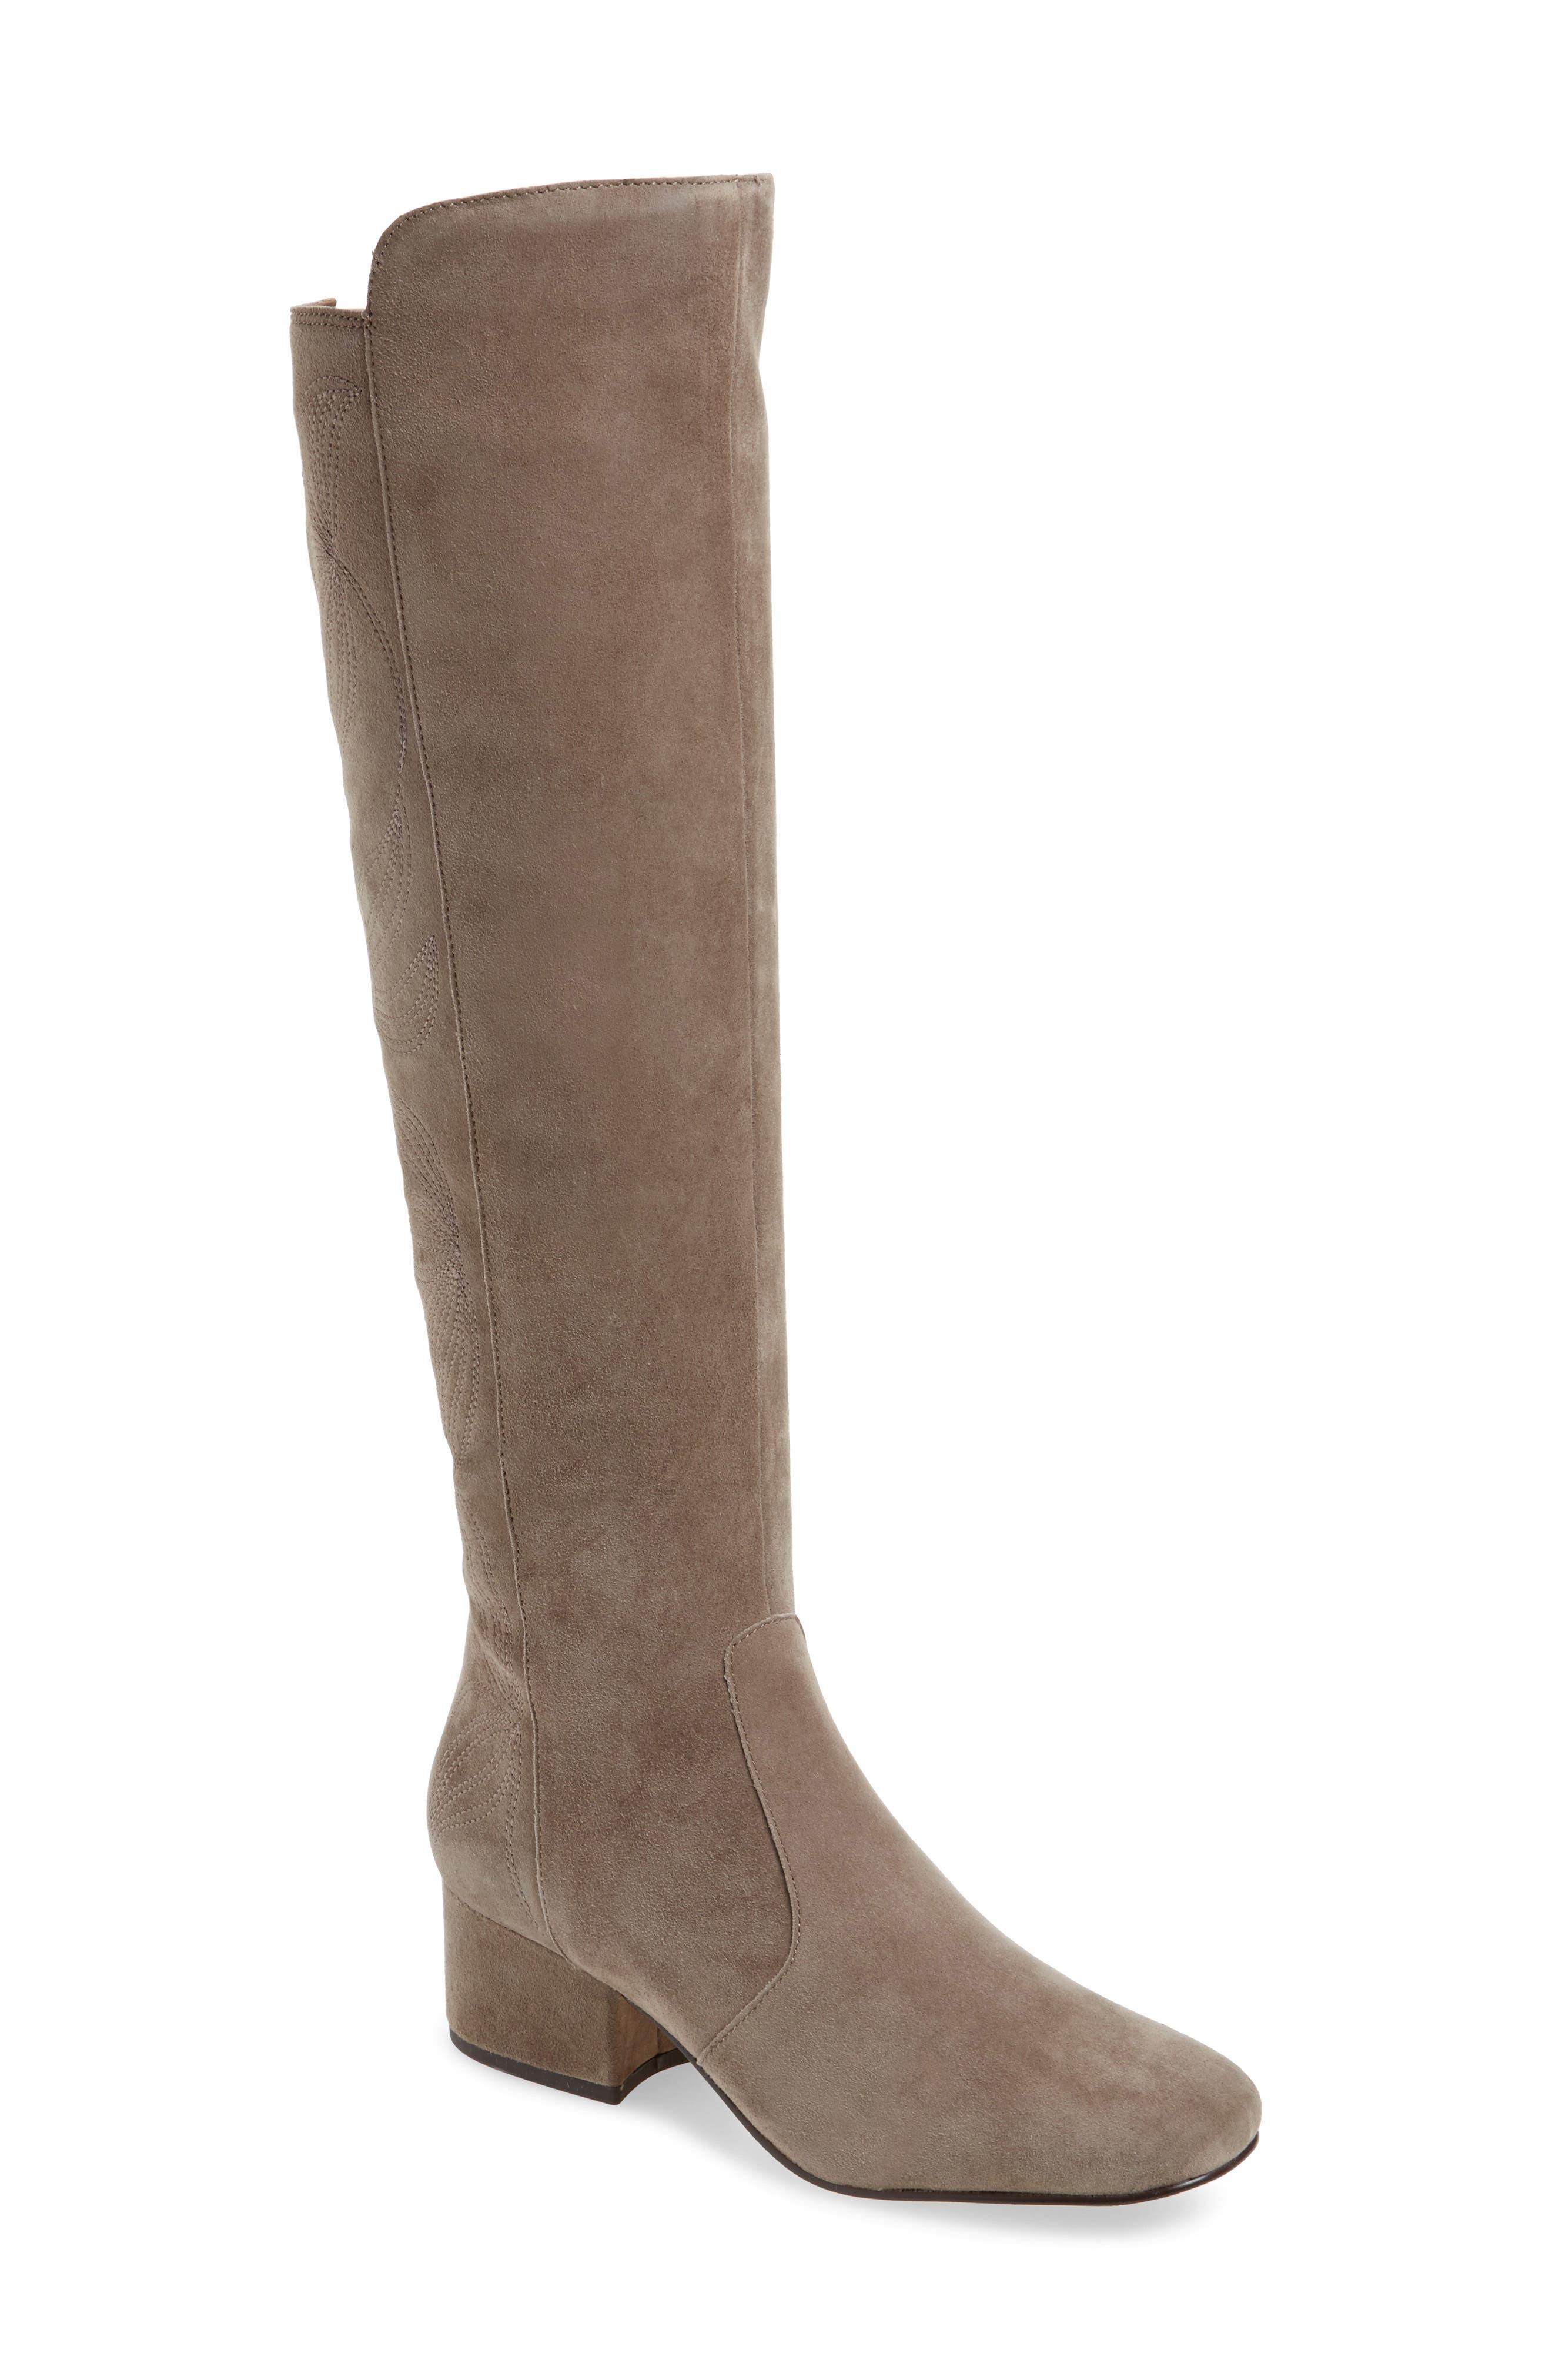 Main Image - Marc Fisher LTD Tawnna Knee High Boot (Women)